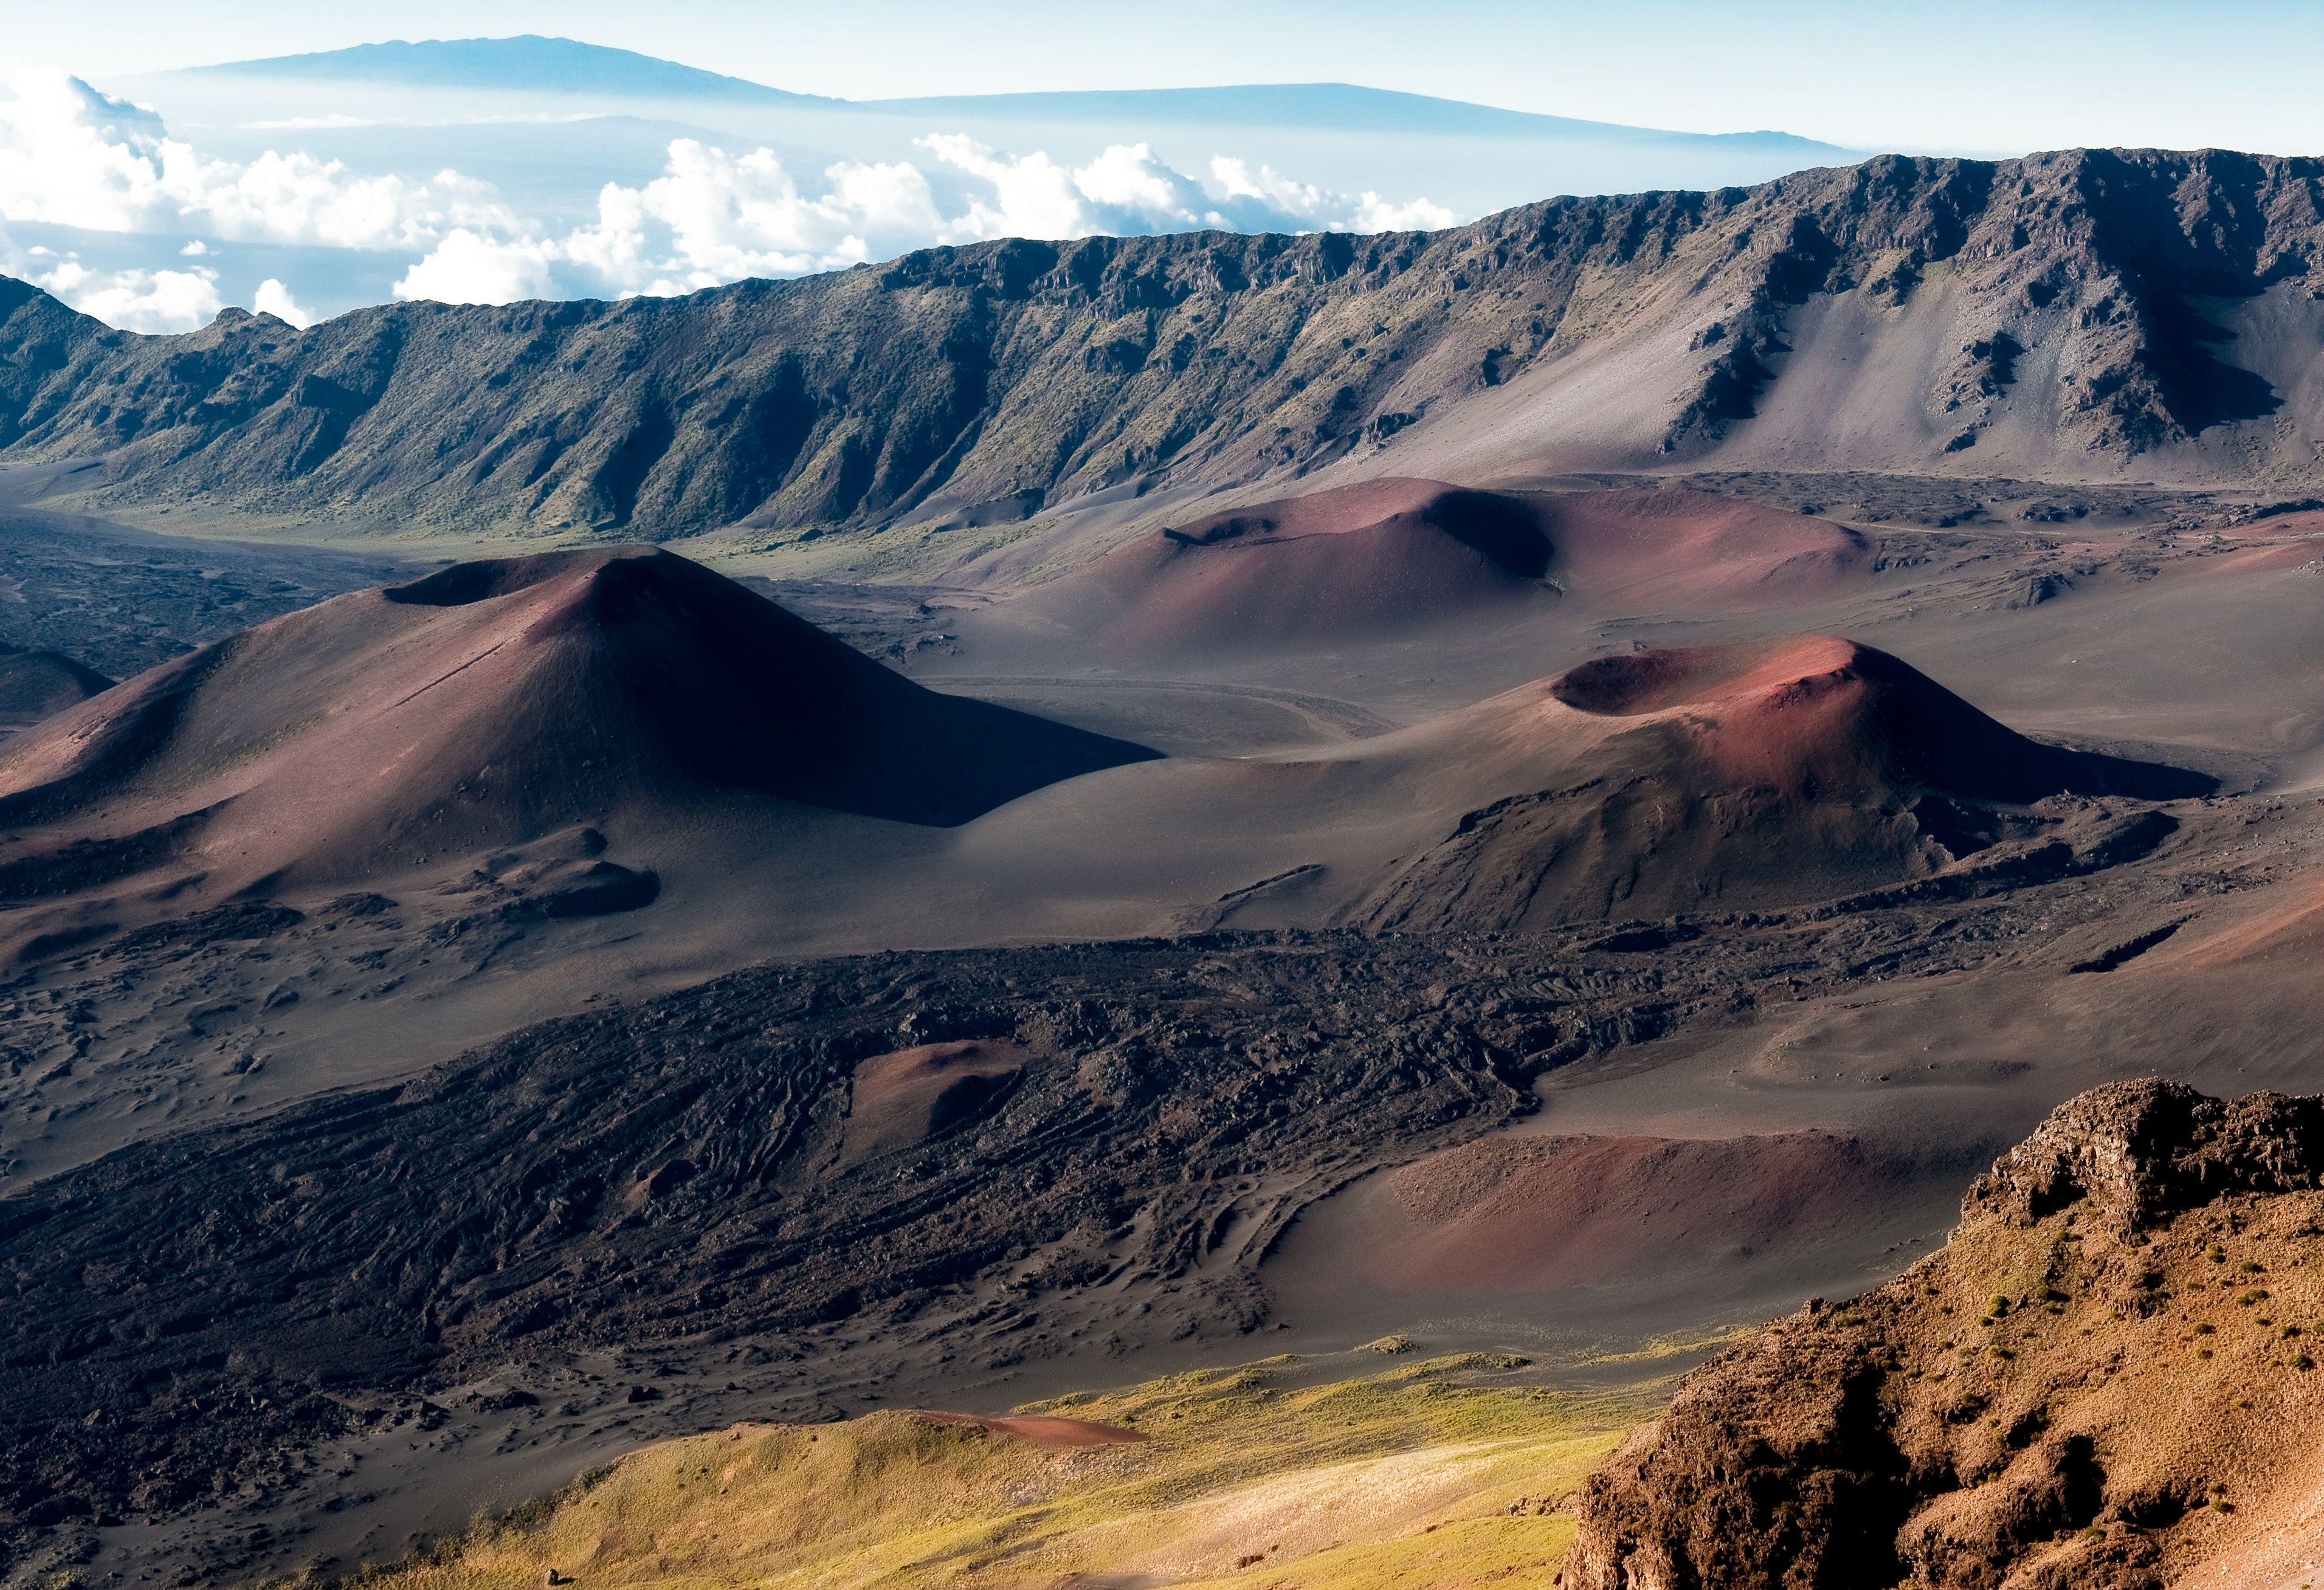 Hd wallpaper haleakala halemaumaucrater hawaii volcanoes hd wallpaper haleakala halemaumaucrater hawaii volcanoes national park nationalpark publicscrutiny Image collections